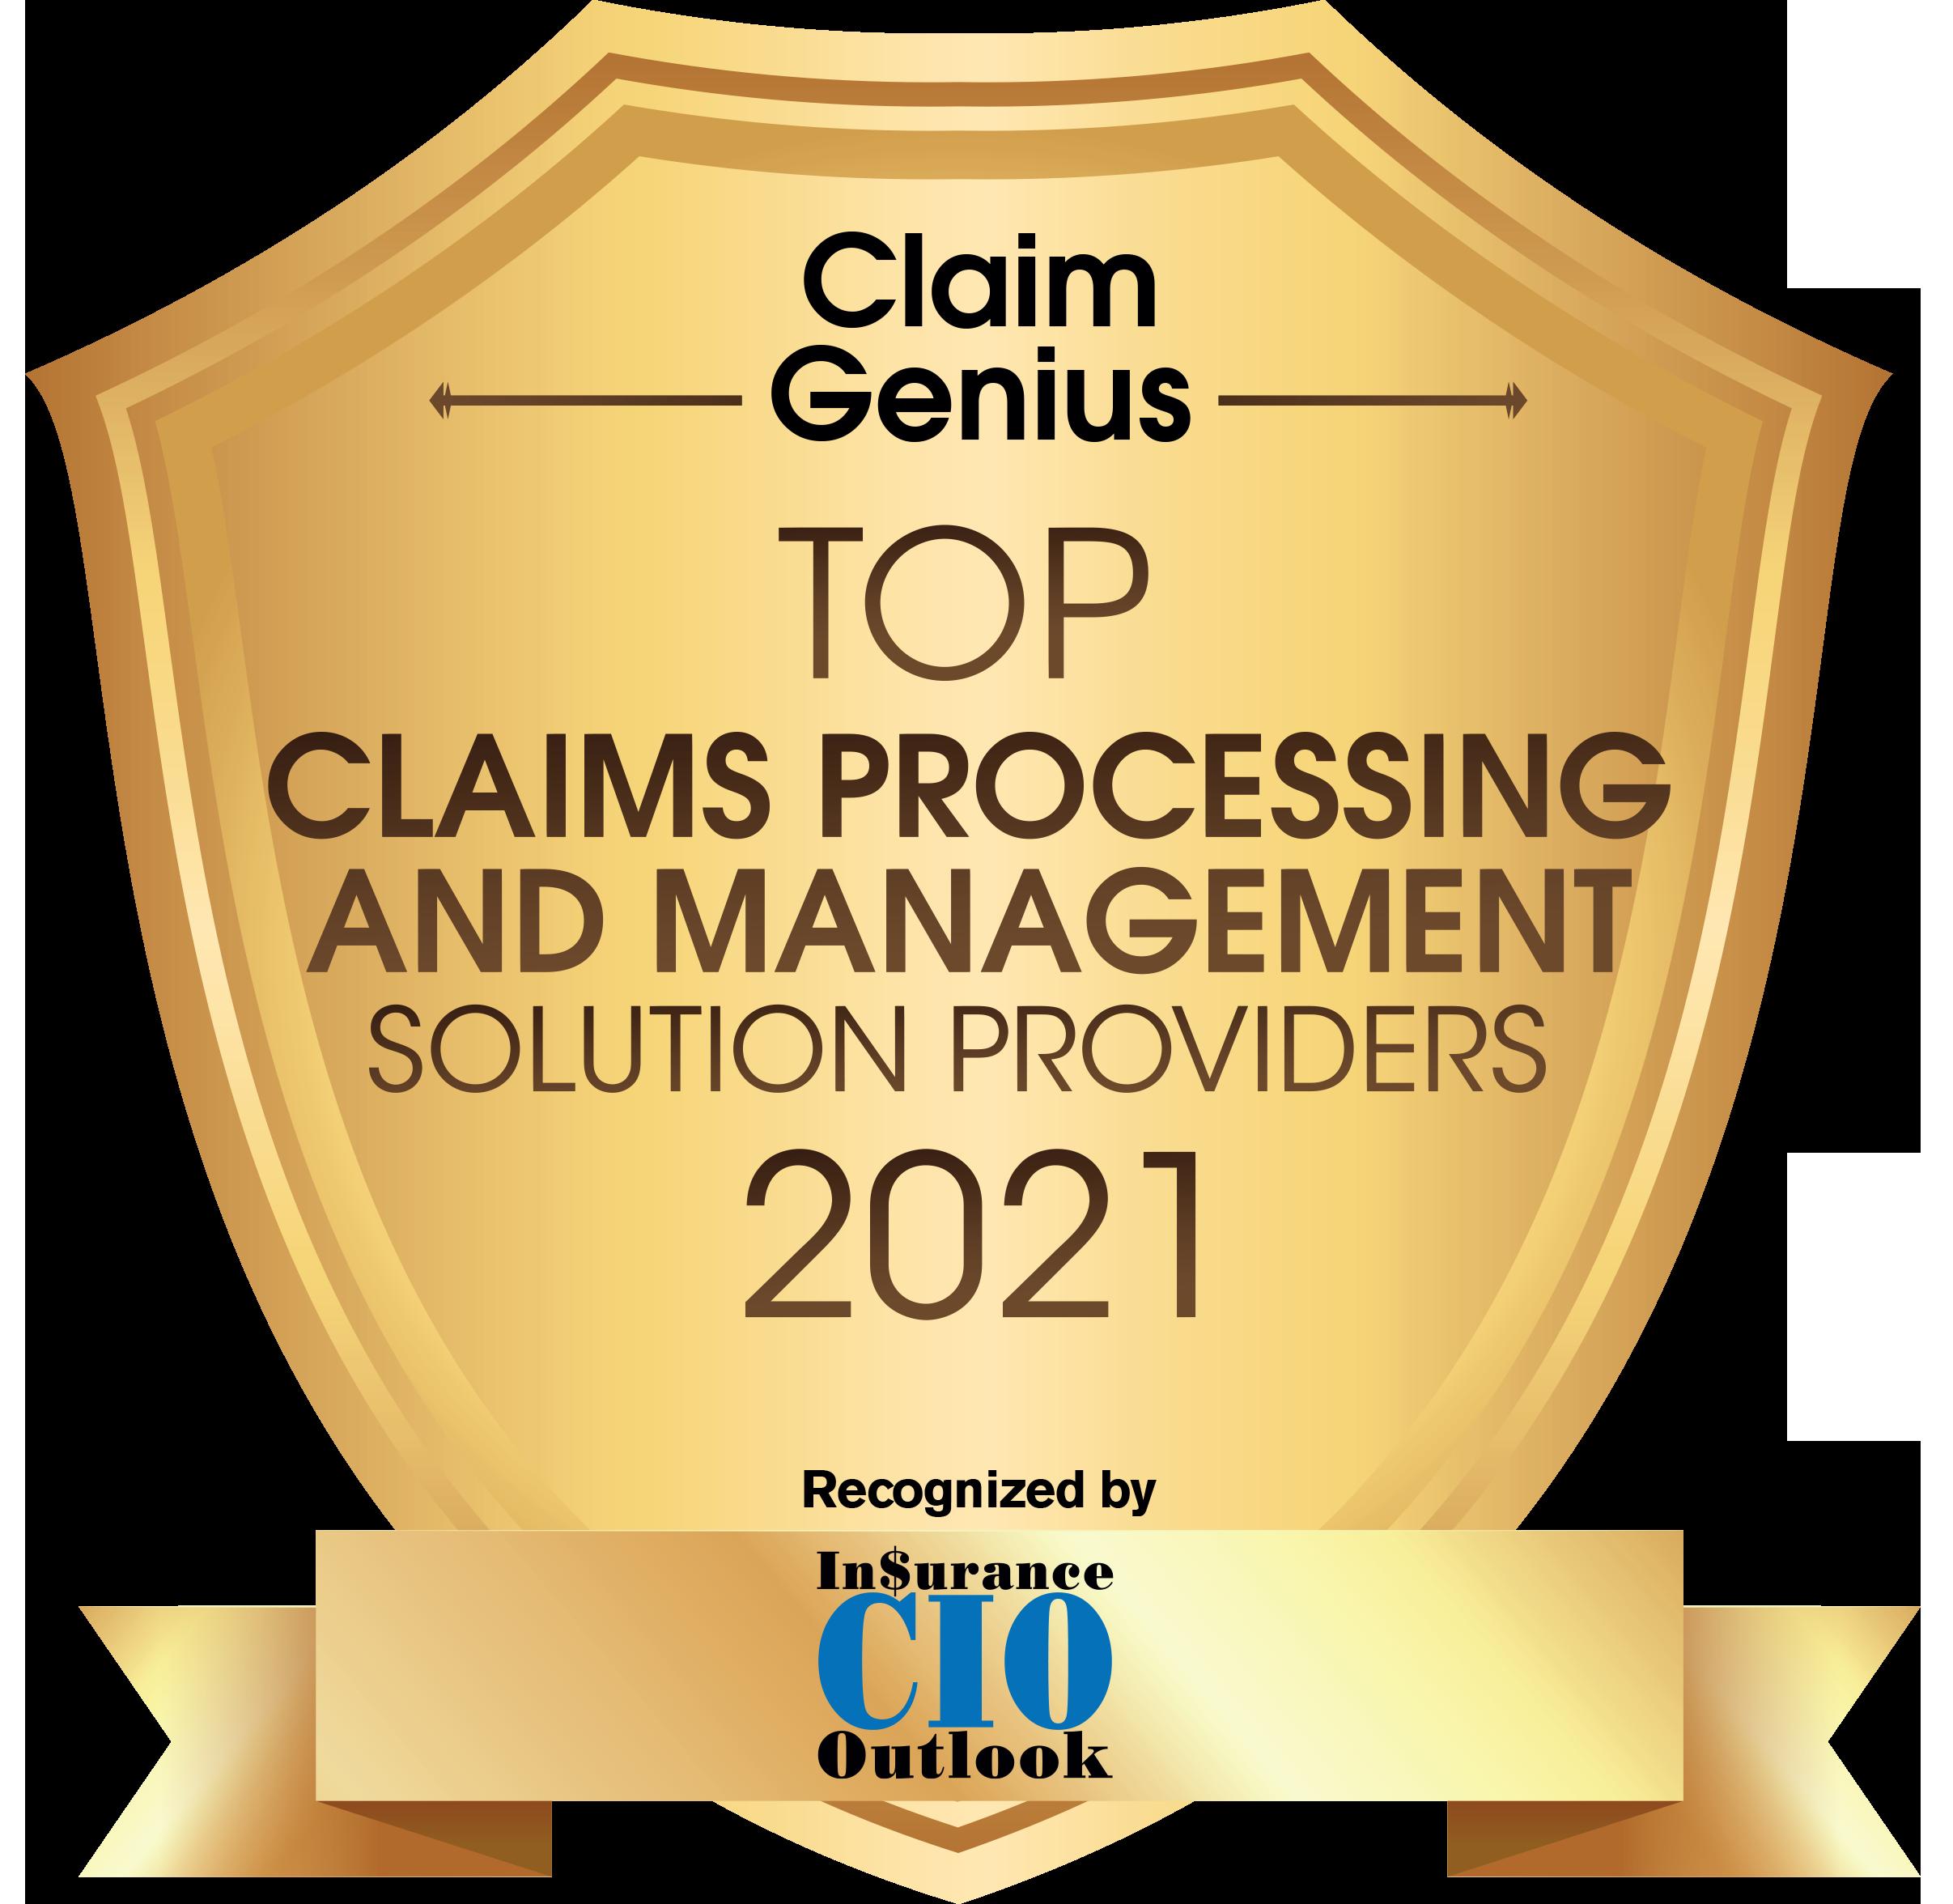 Claim Genius Bags The CIO Insurance Outlook Award